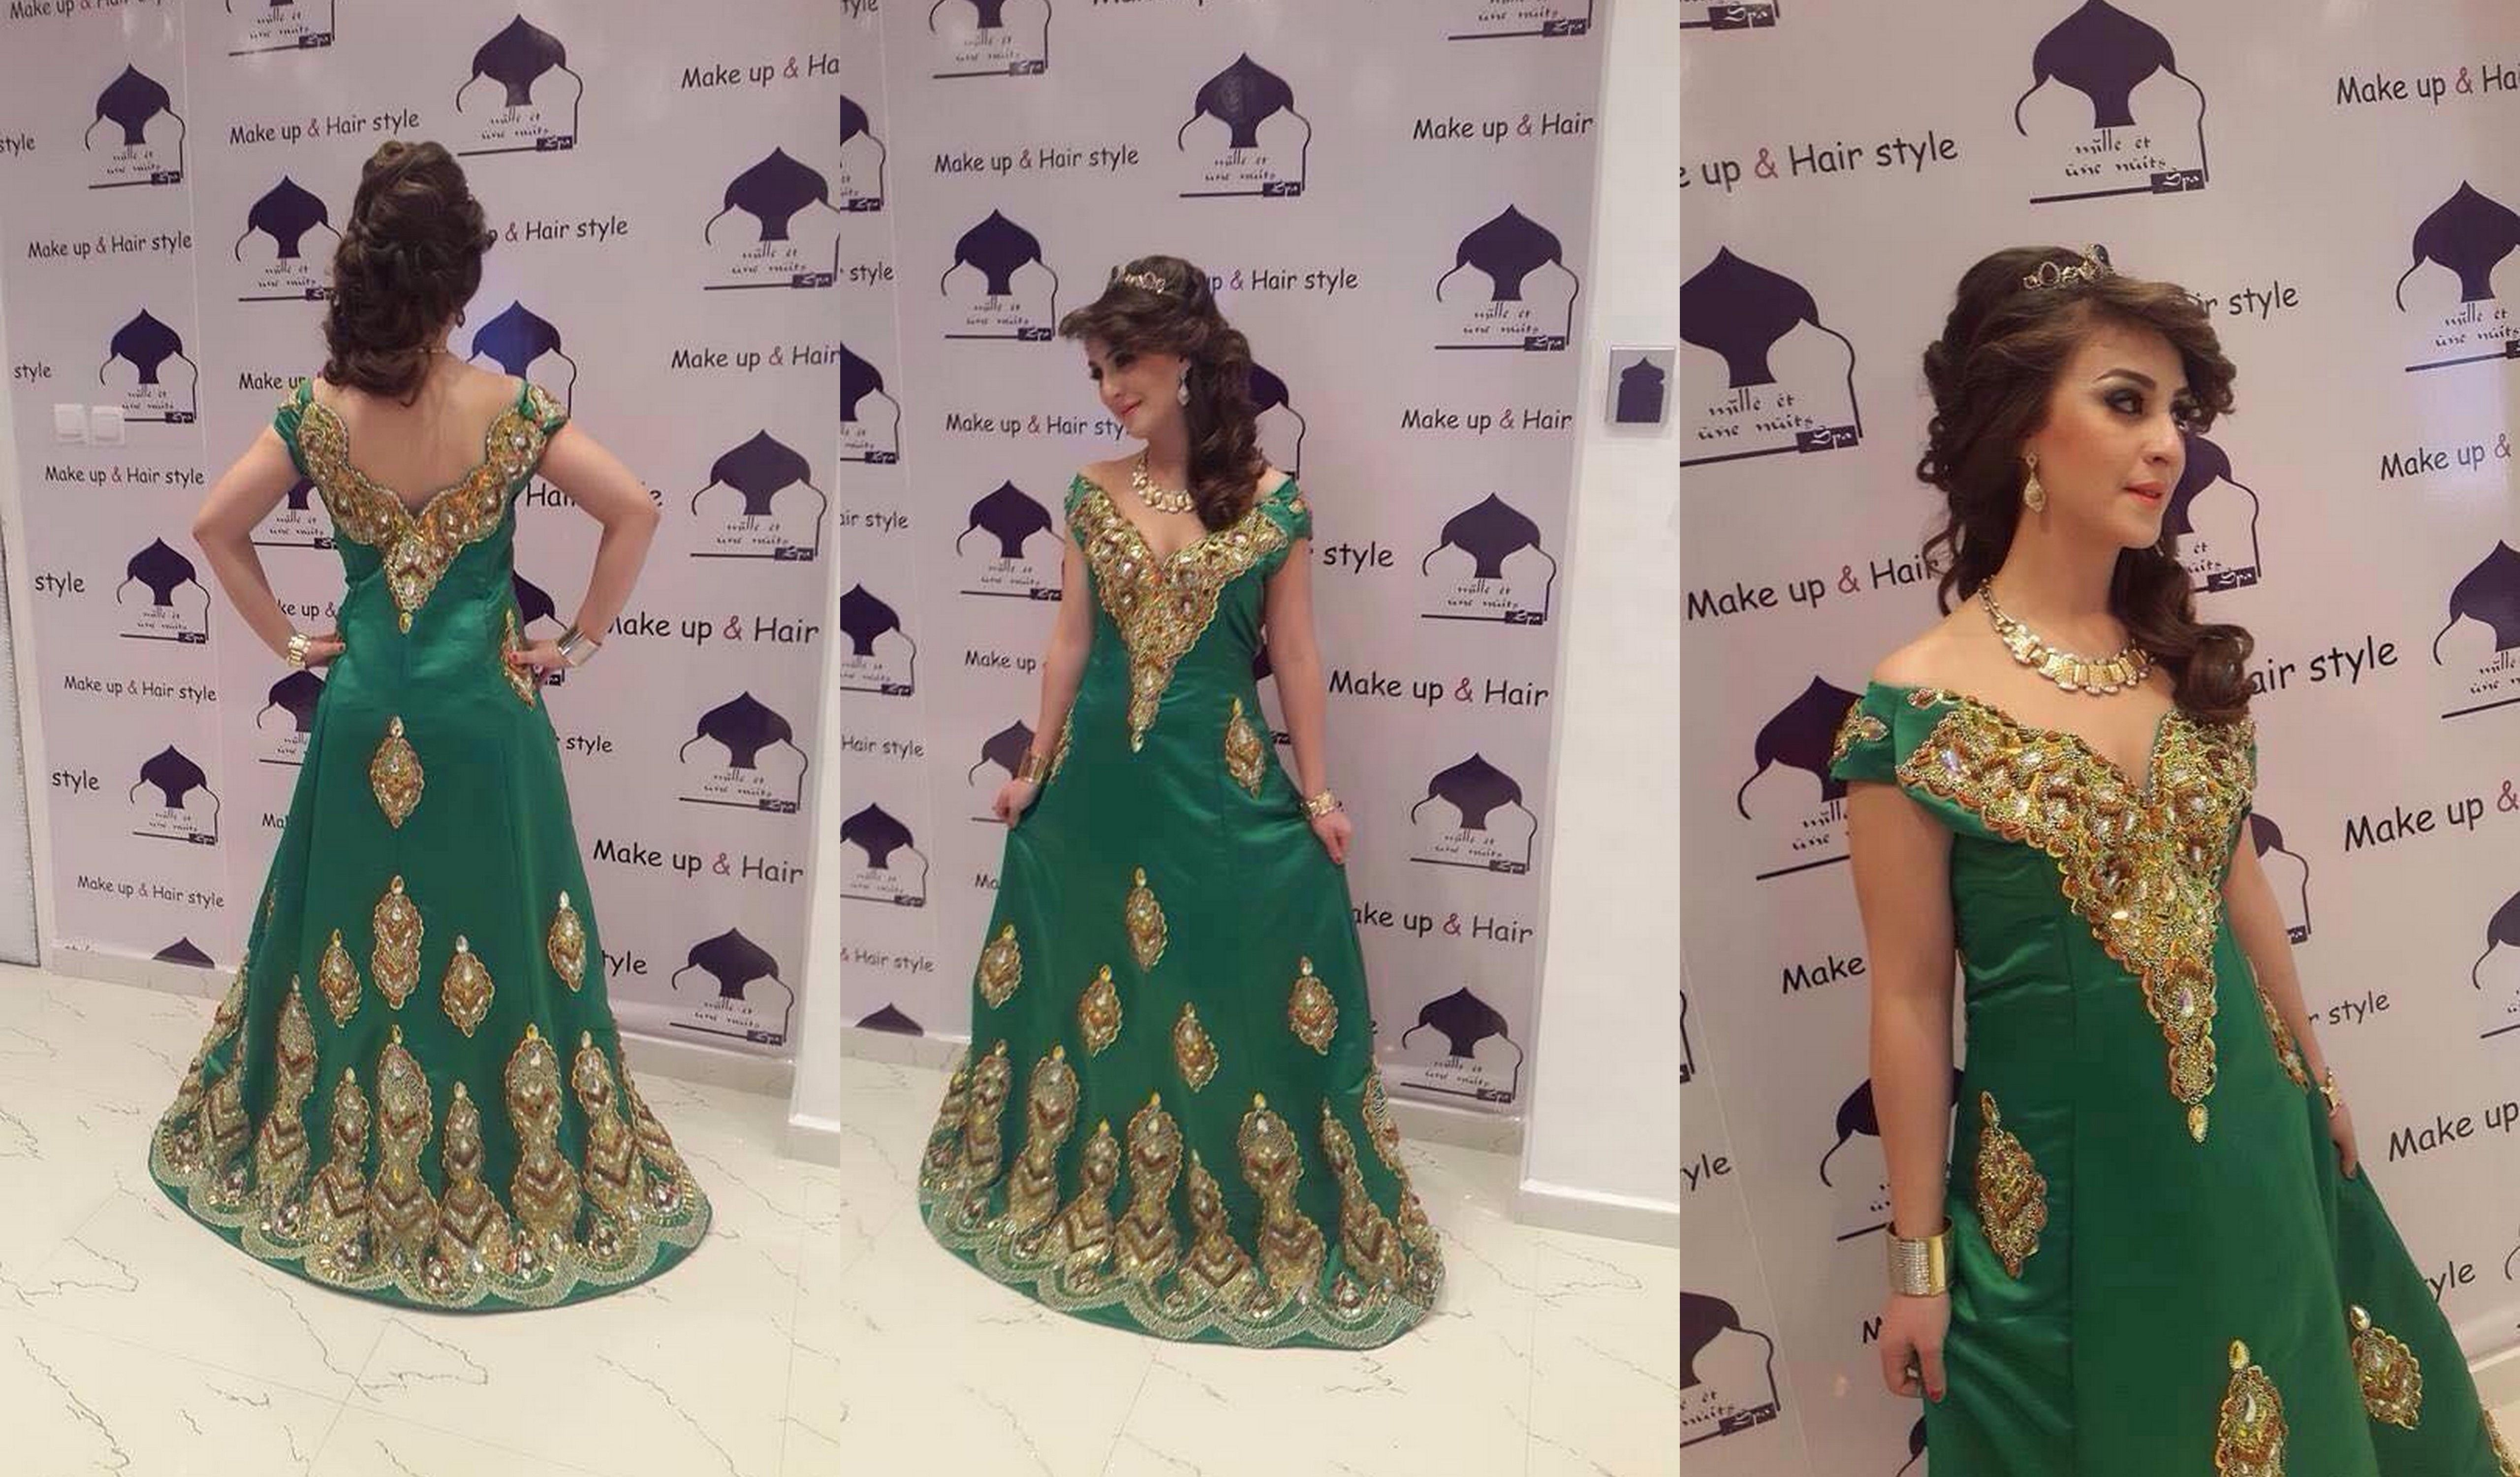 فستان اخضر رائع للتصديرة Formal Dresses Fashion Dresses